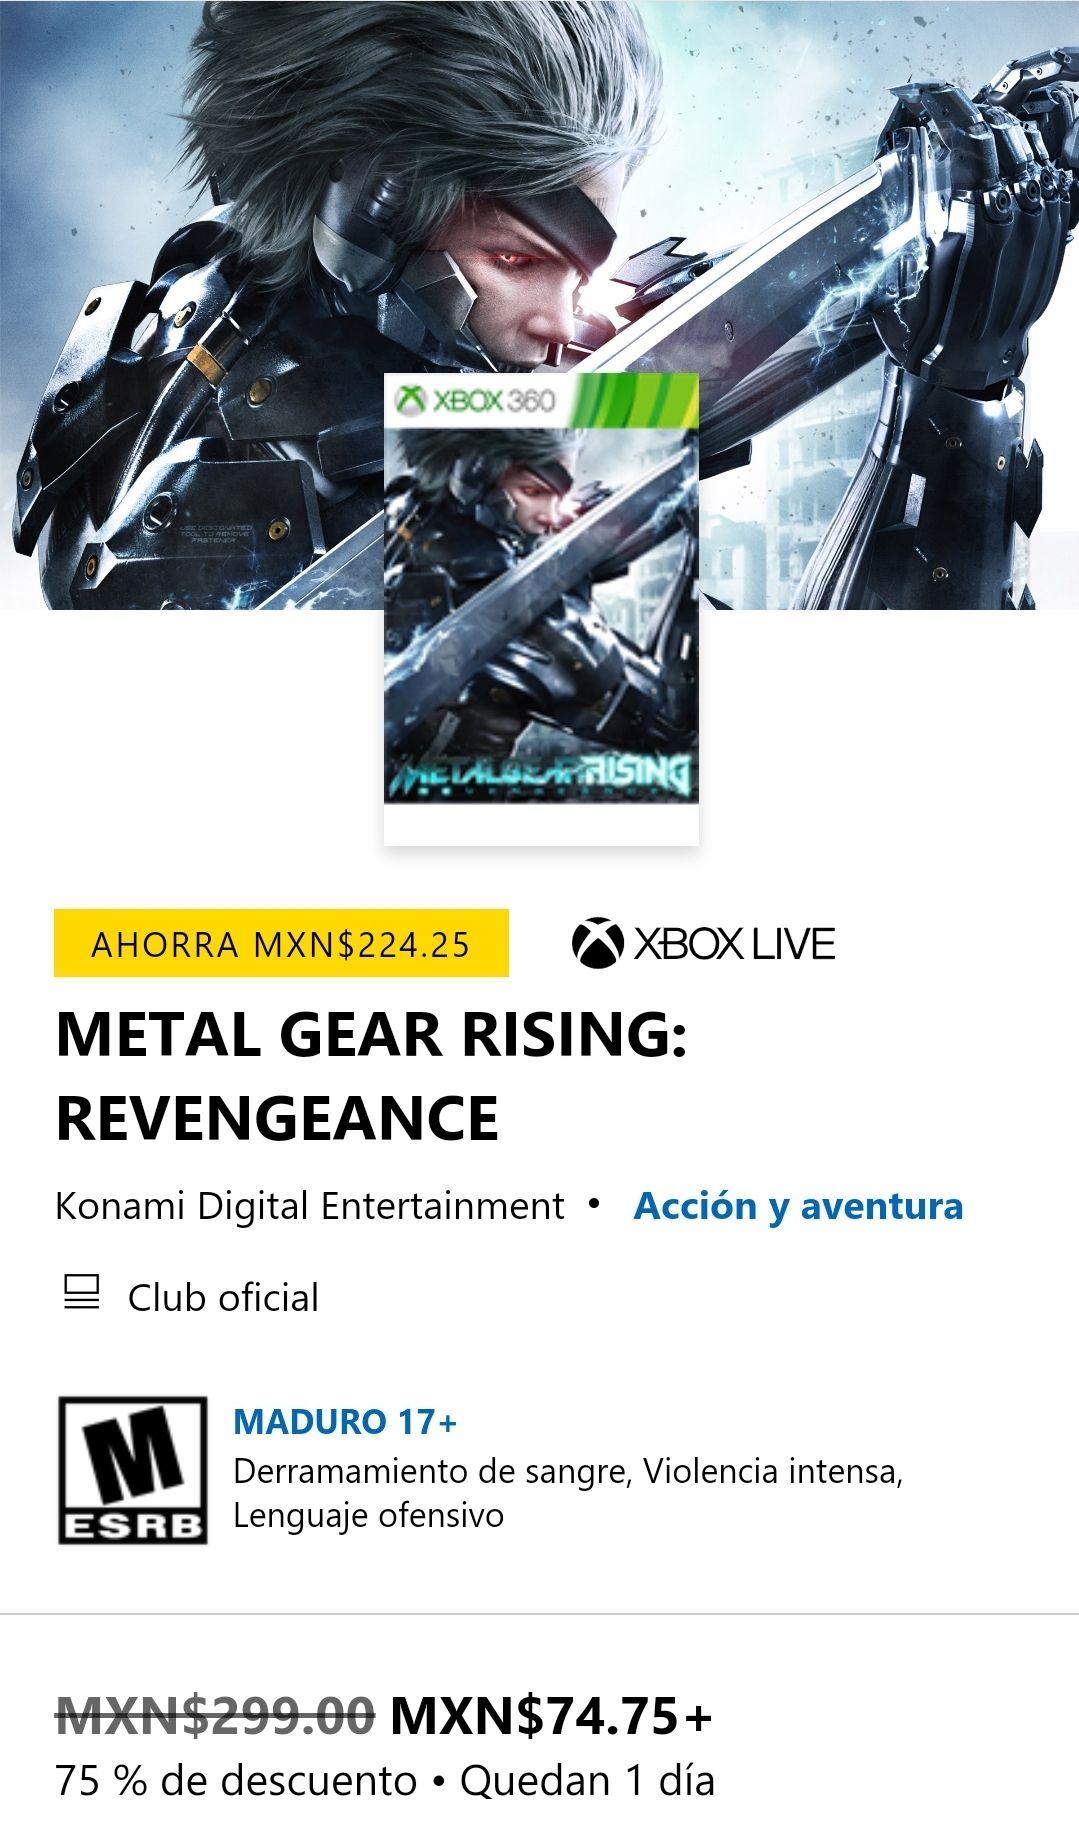 Microsoft Store: Metal Gear Rising: Revengeance